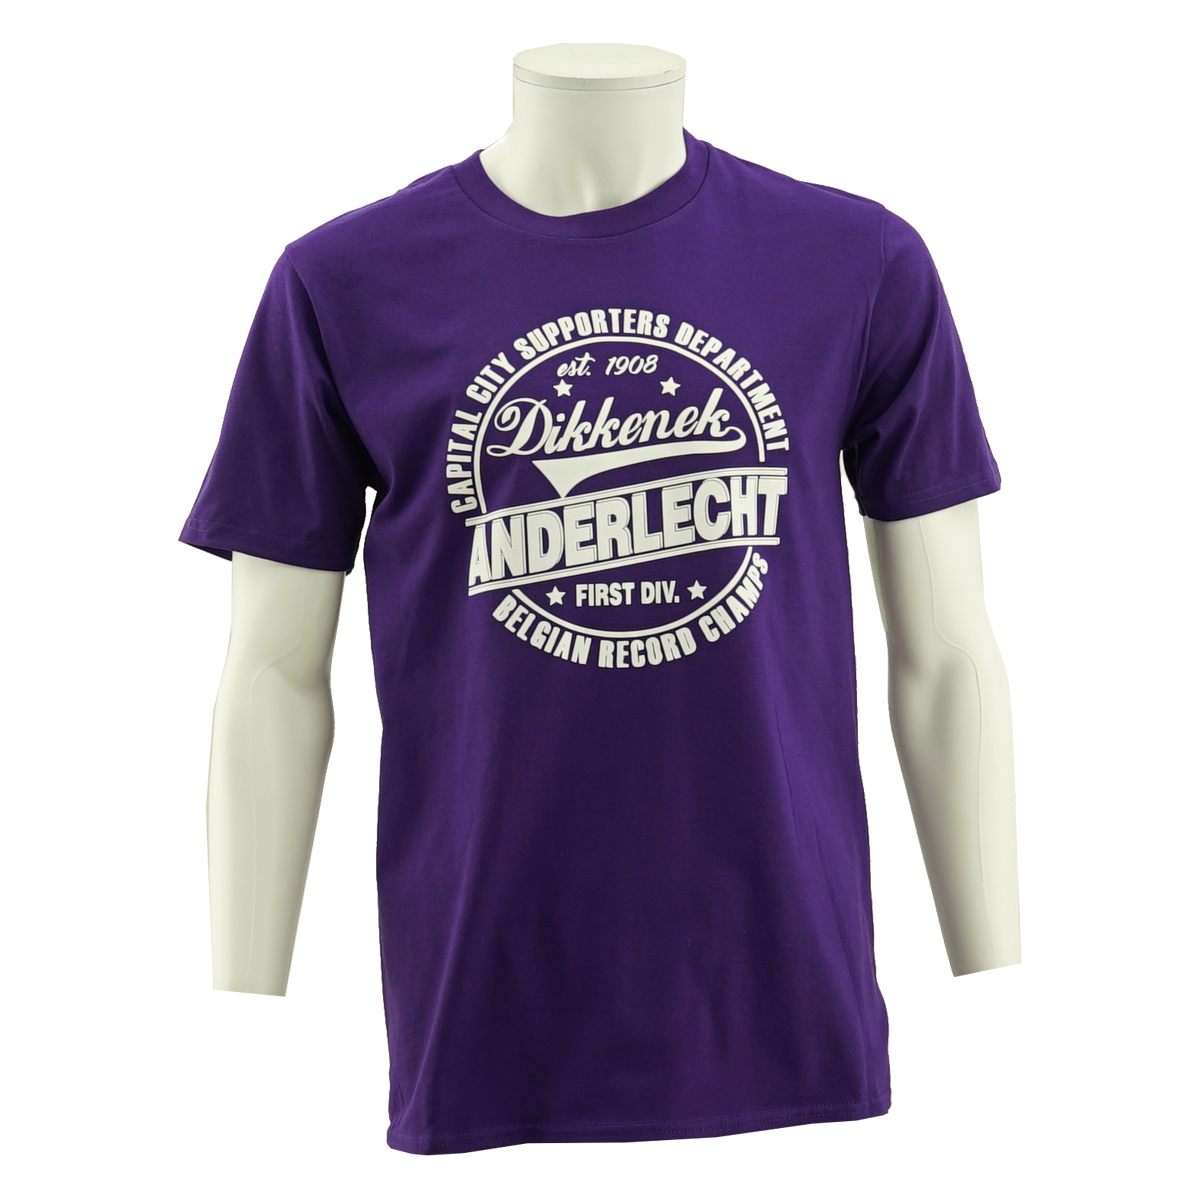 RSCA T-Shirt Mauff Record Champ